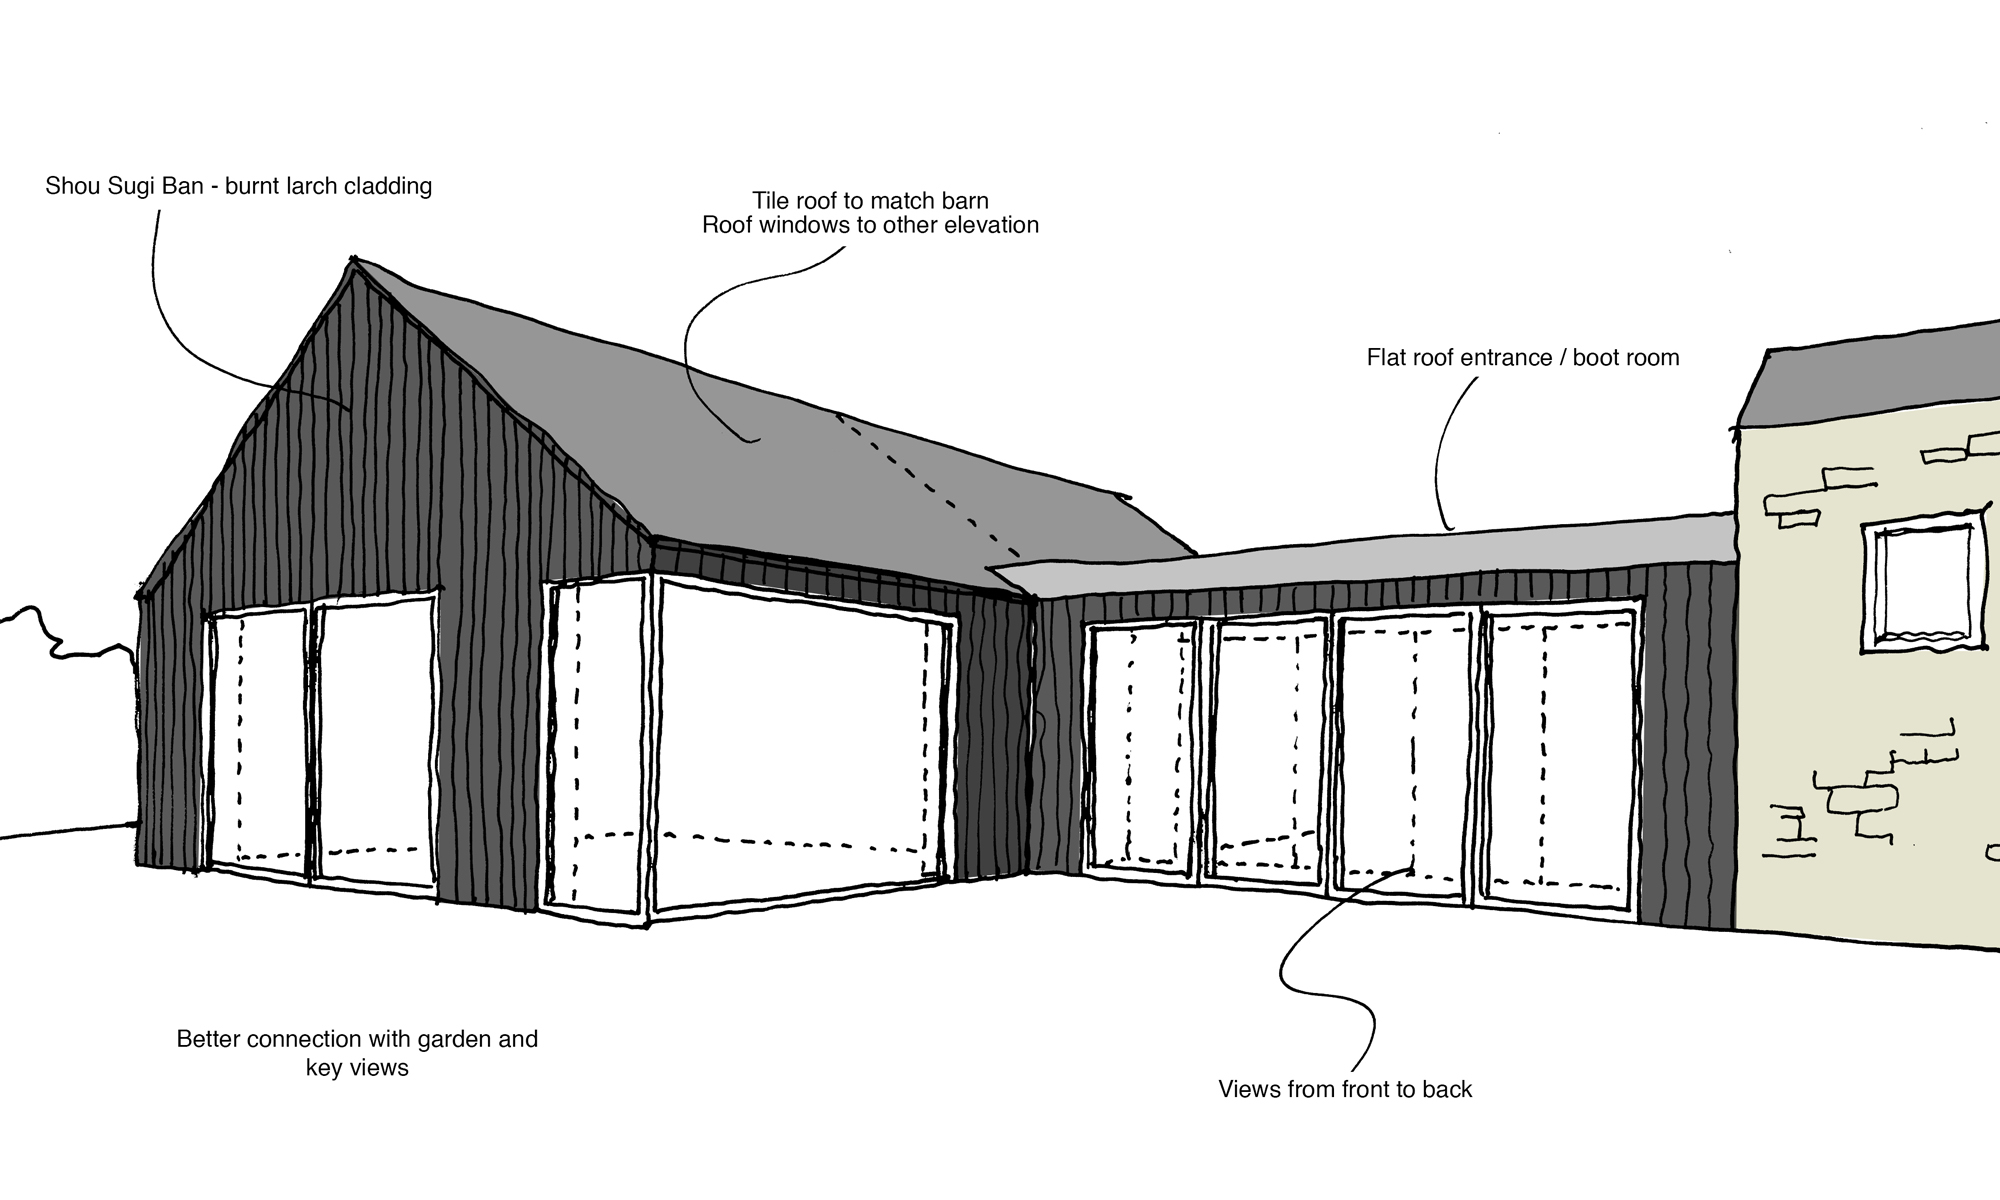 Charred Barn Concept Sketch